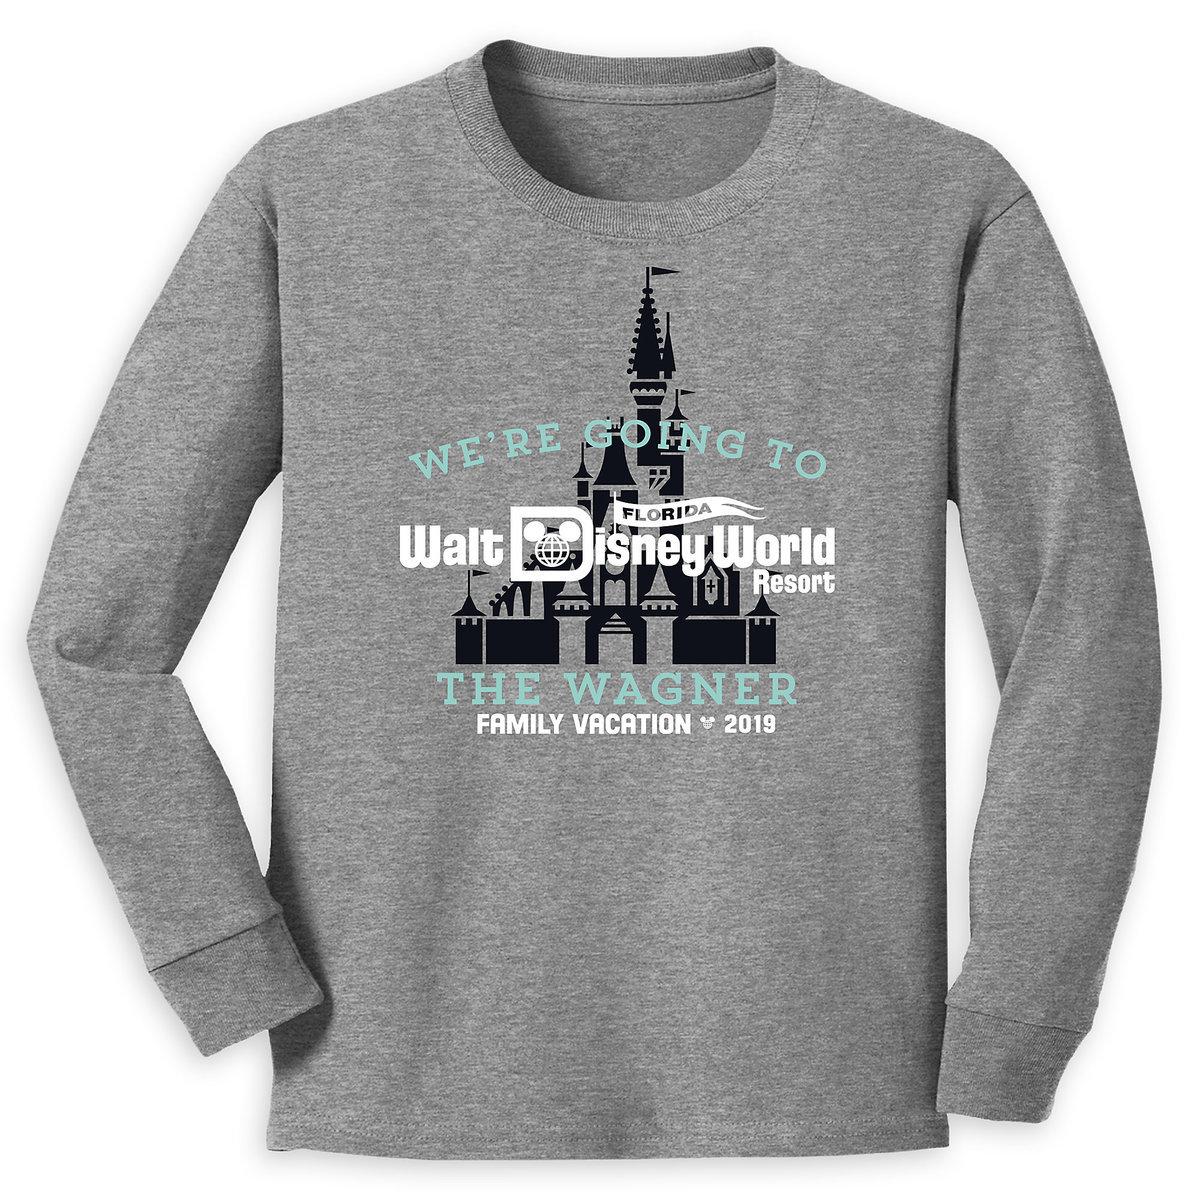 0c80c610 Product Image of Walt Disney World 2019 Family Vacation Long Sleeve Shirt  for Kids - Customized